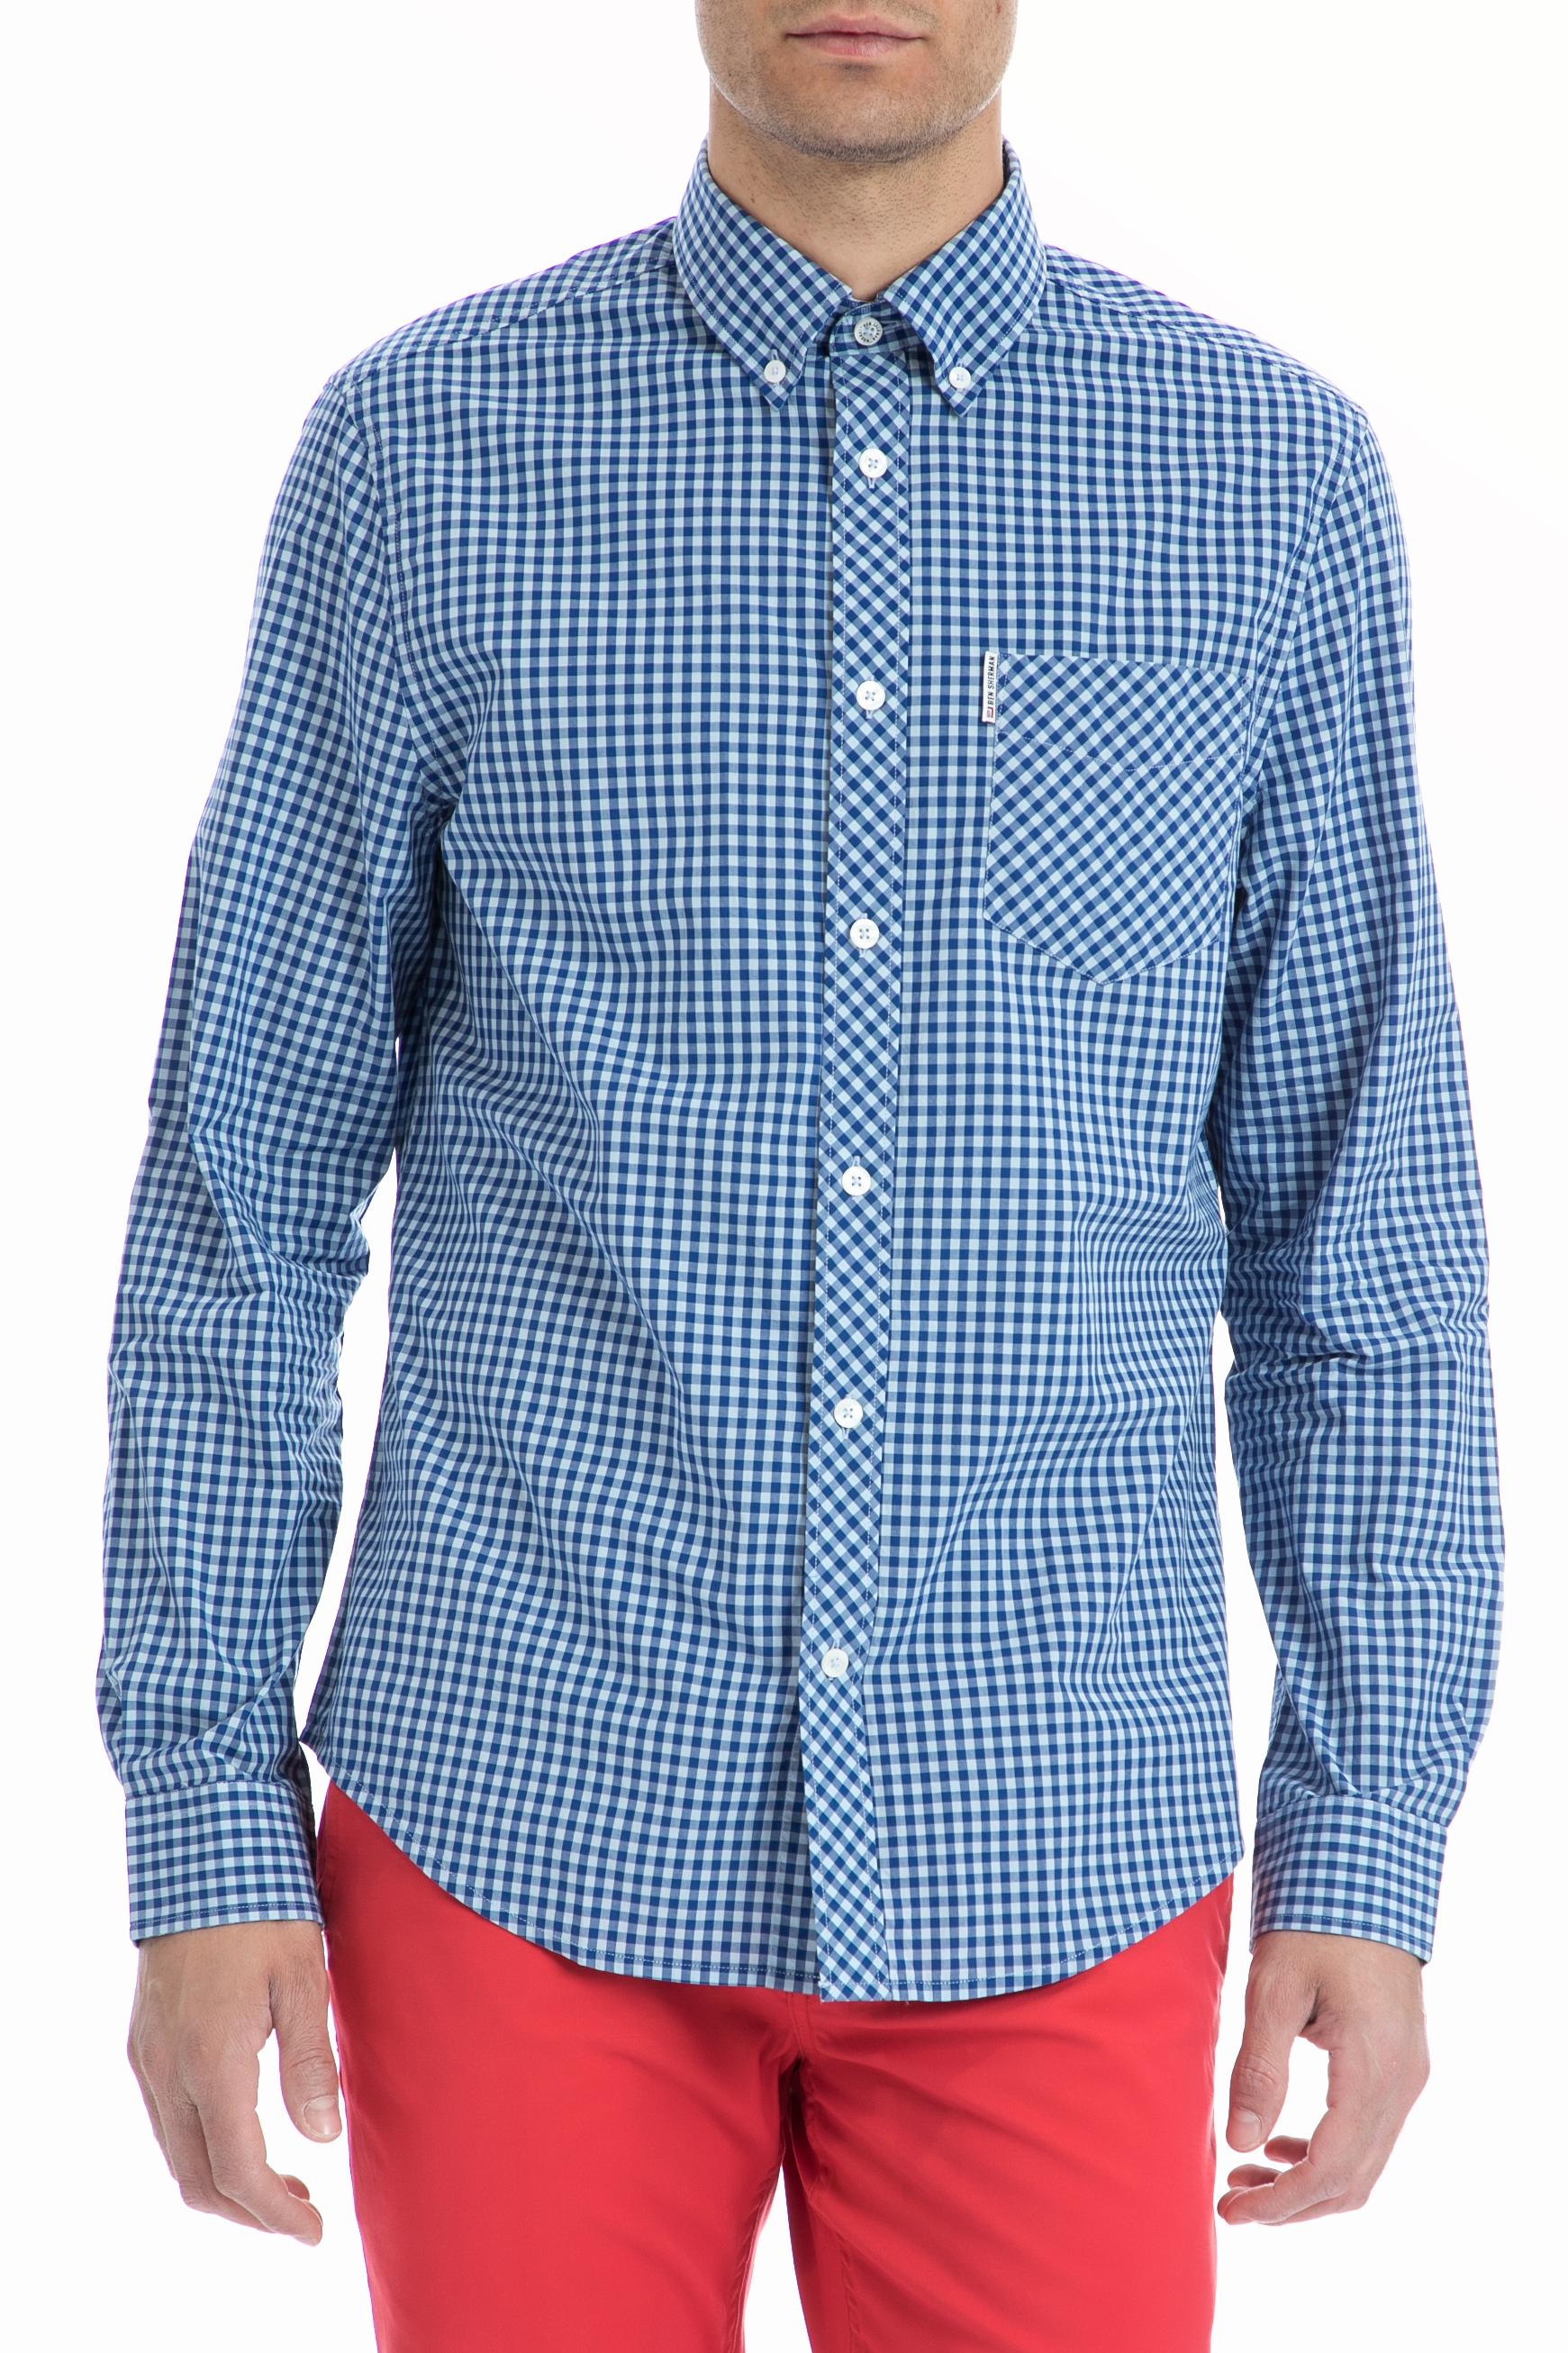 f785fea8f4ee Factoryoutlet BEN SHERMAN - Ανδρικό πουκάμισο Ben Sherman μπλε-λευκό